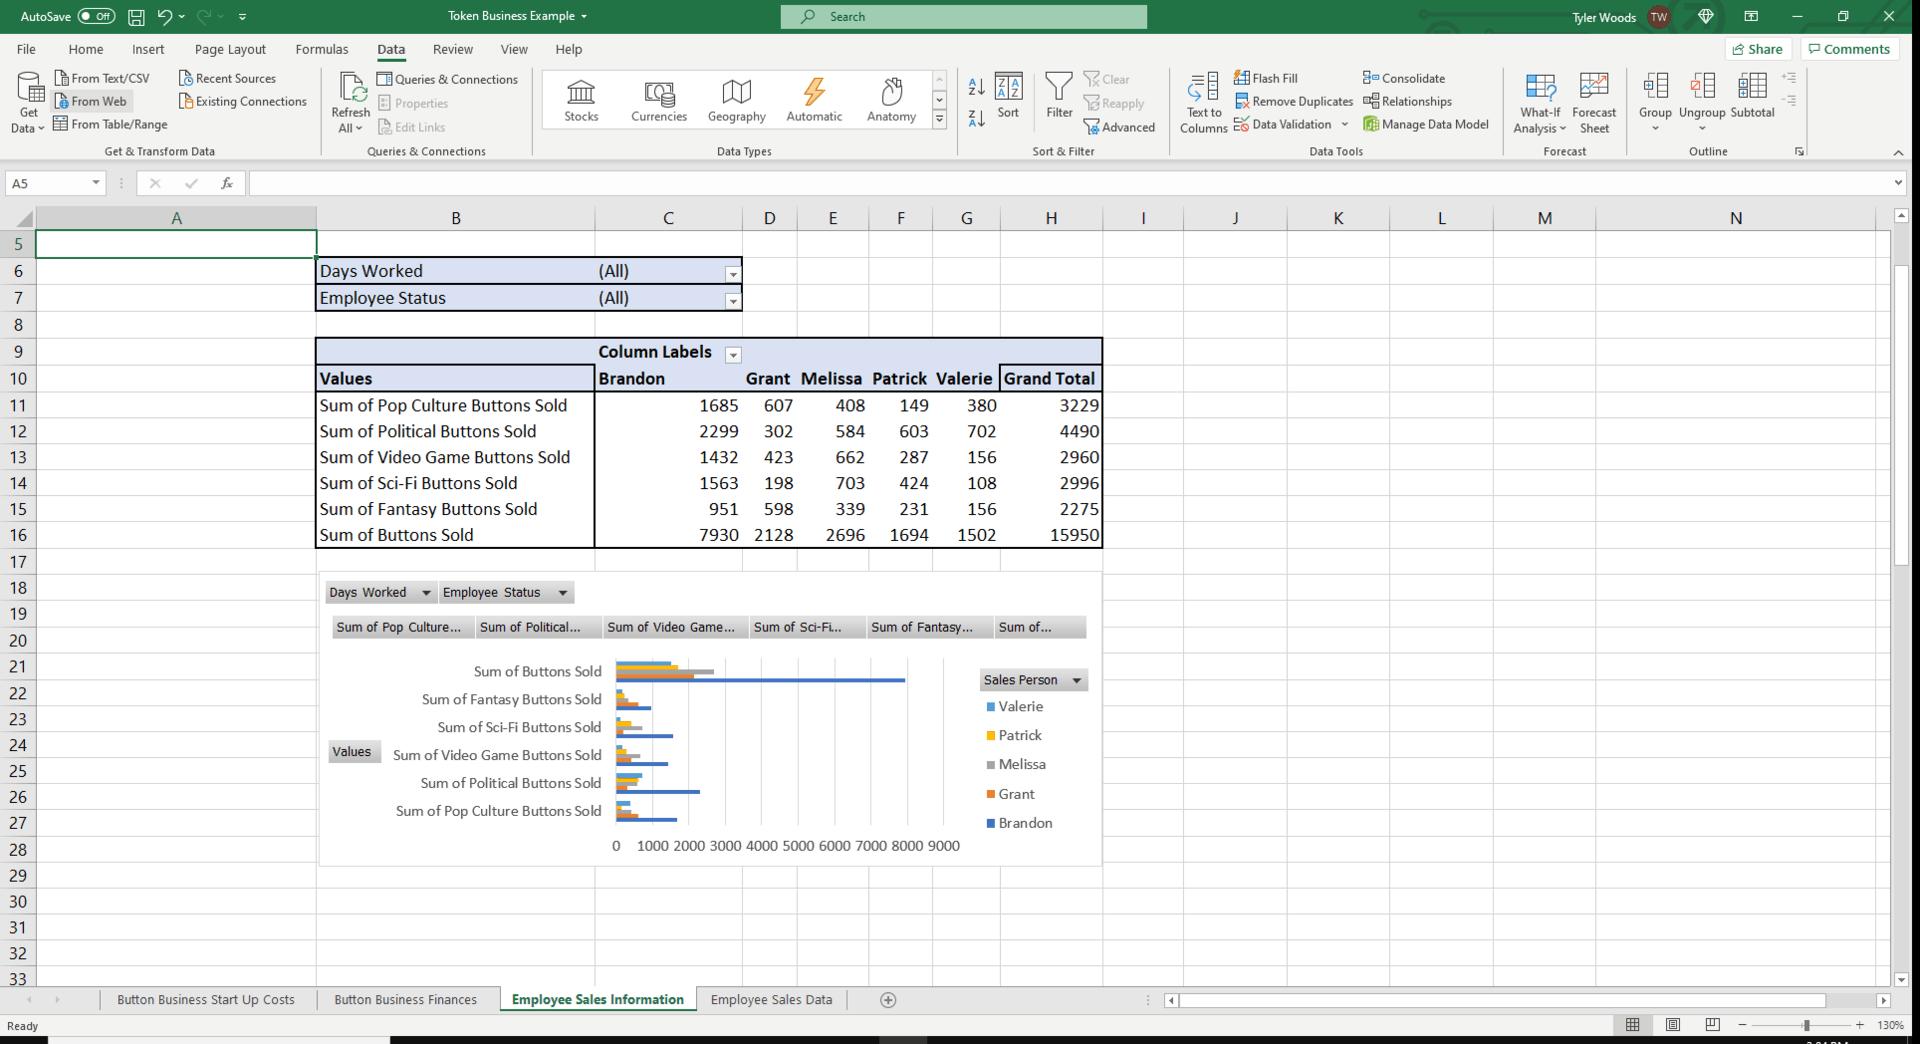 Employee Sales Information 2